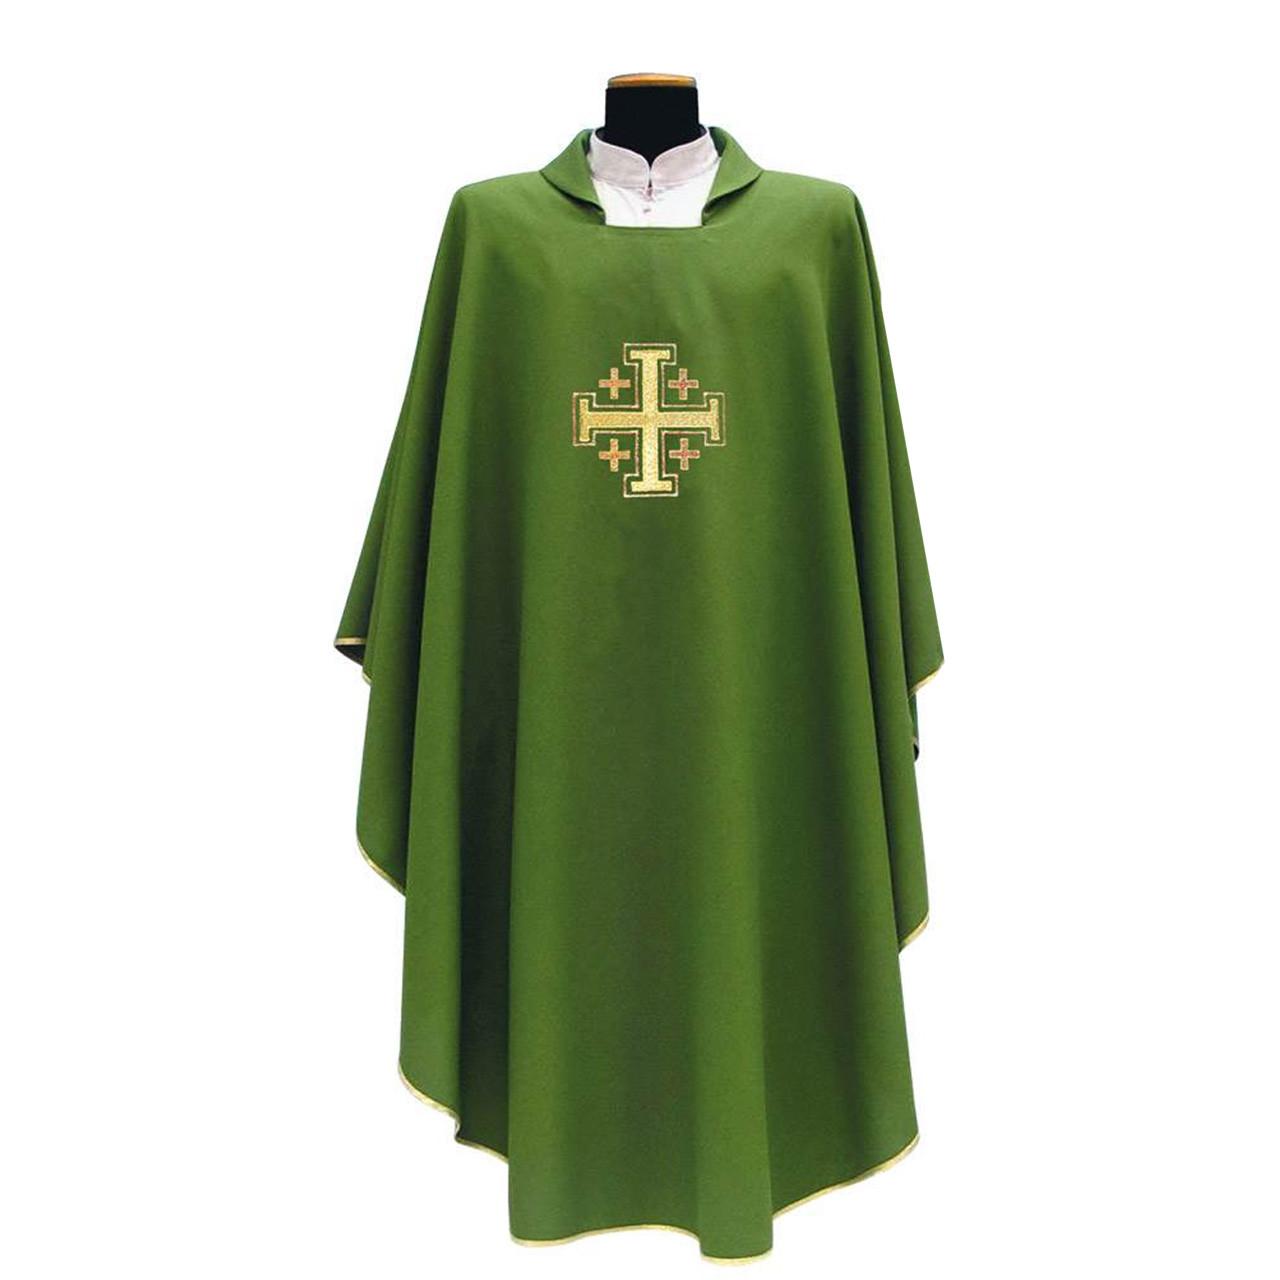 137 Chasuble in Green Primavera